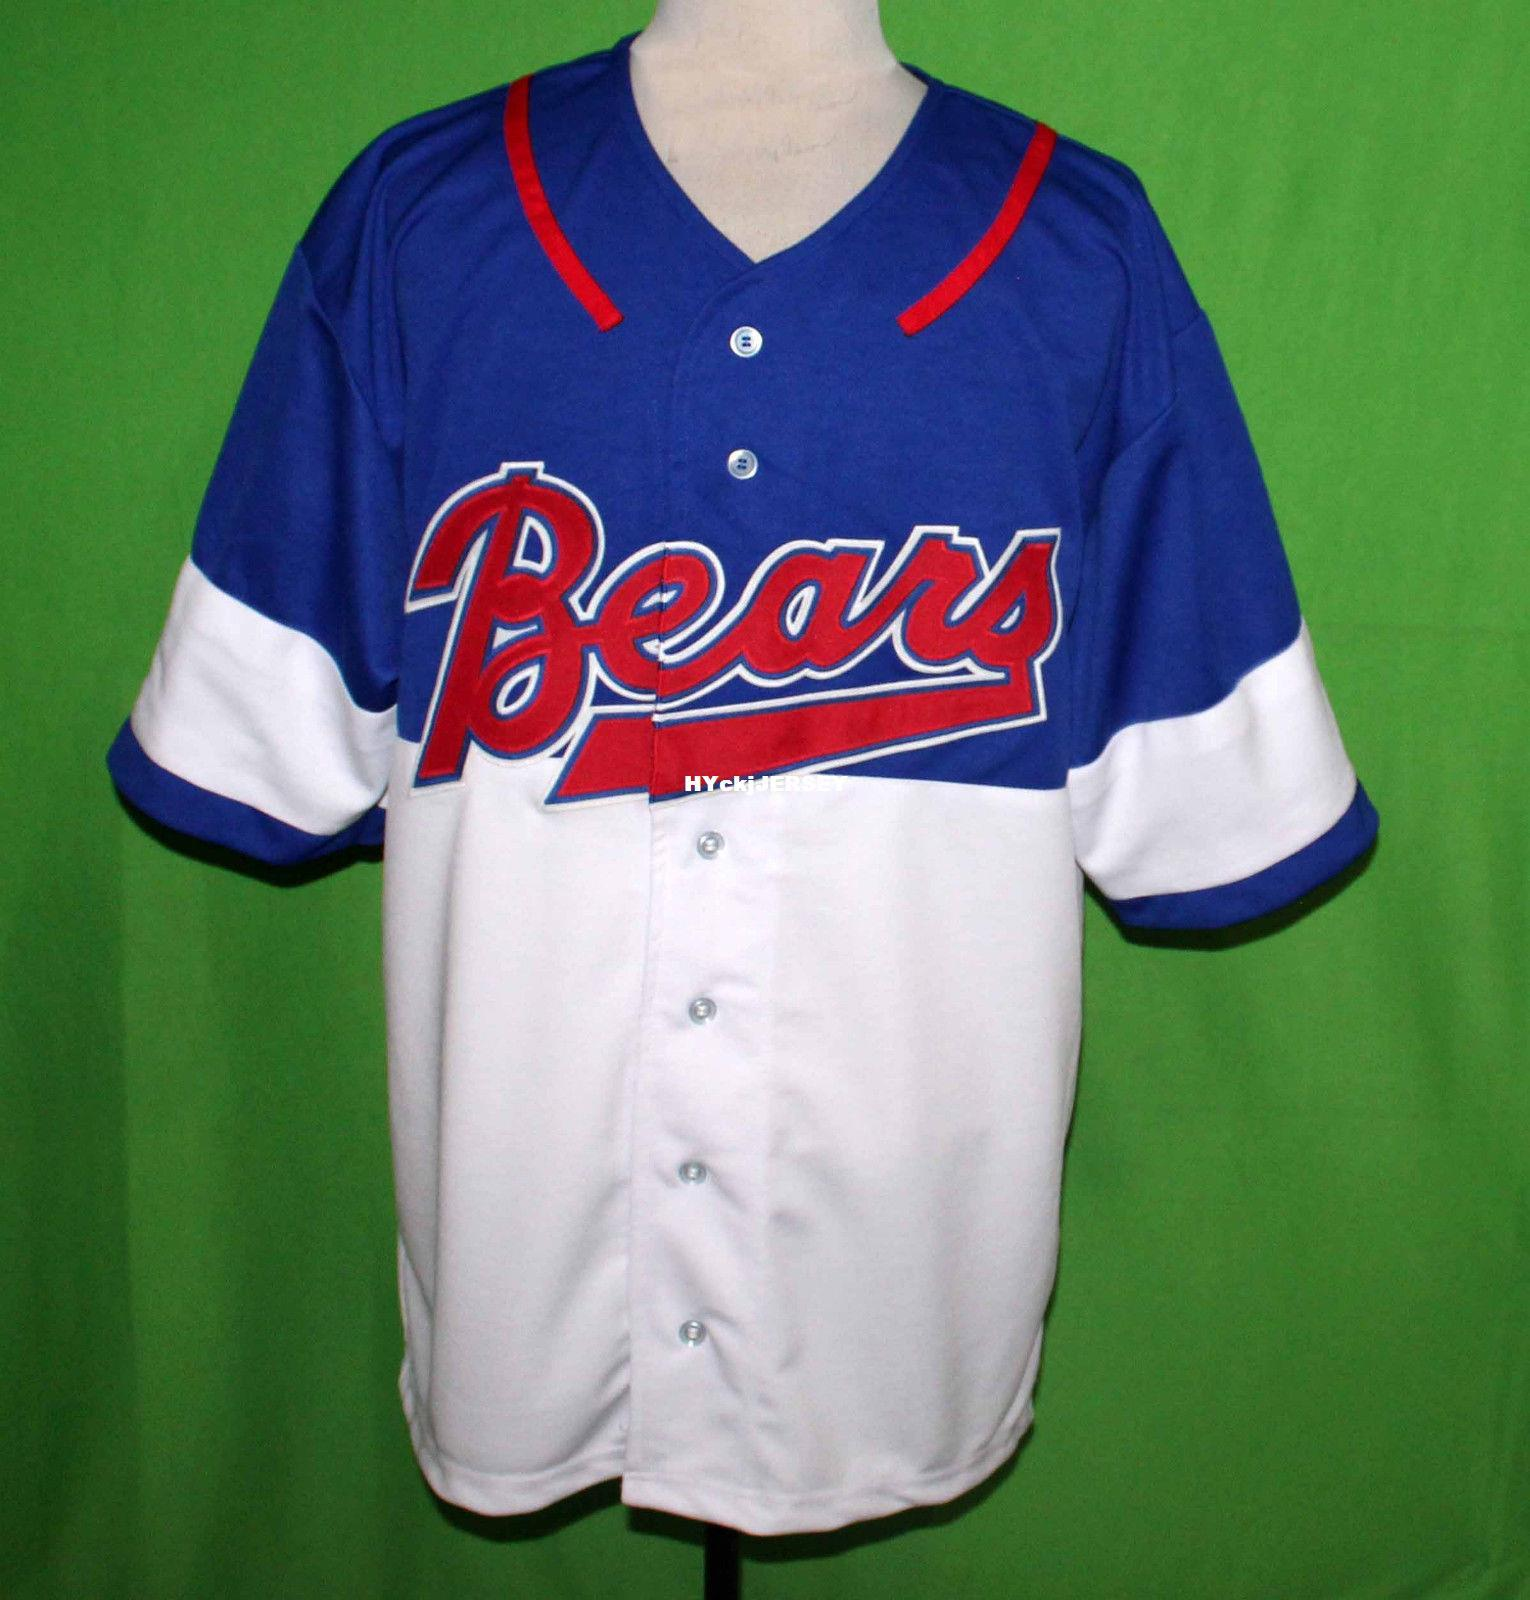 official photos fda8a ef938 Cheap Retro DENVER BEARS #7 1952 Home BASEBALL JERSEY Or Custom any number  any Mens Vintage jerseys XS - 5XL